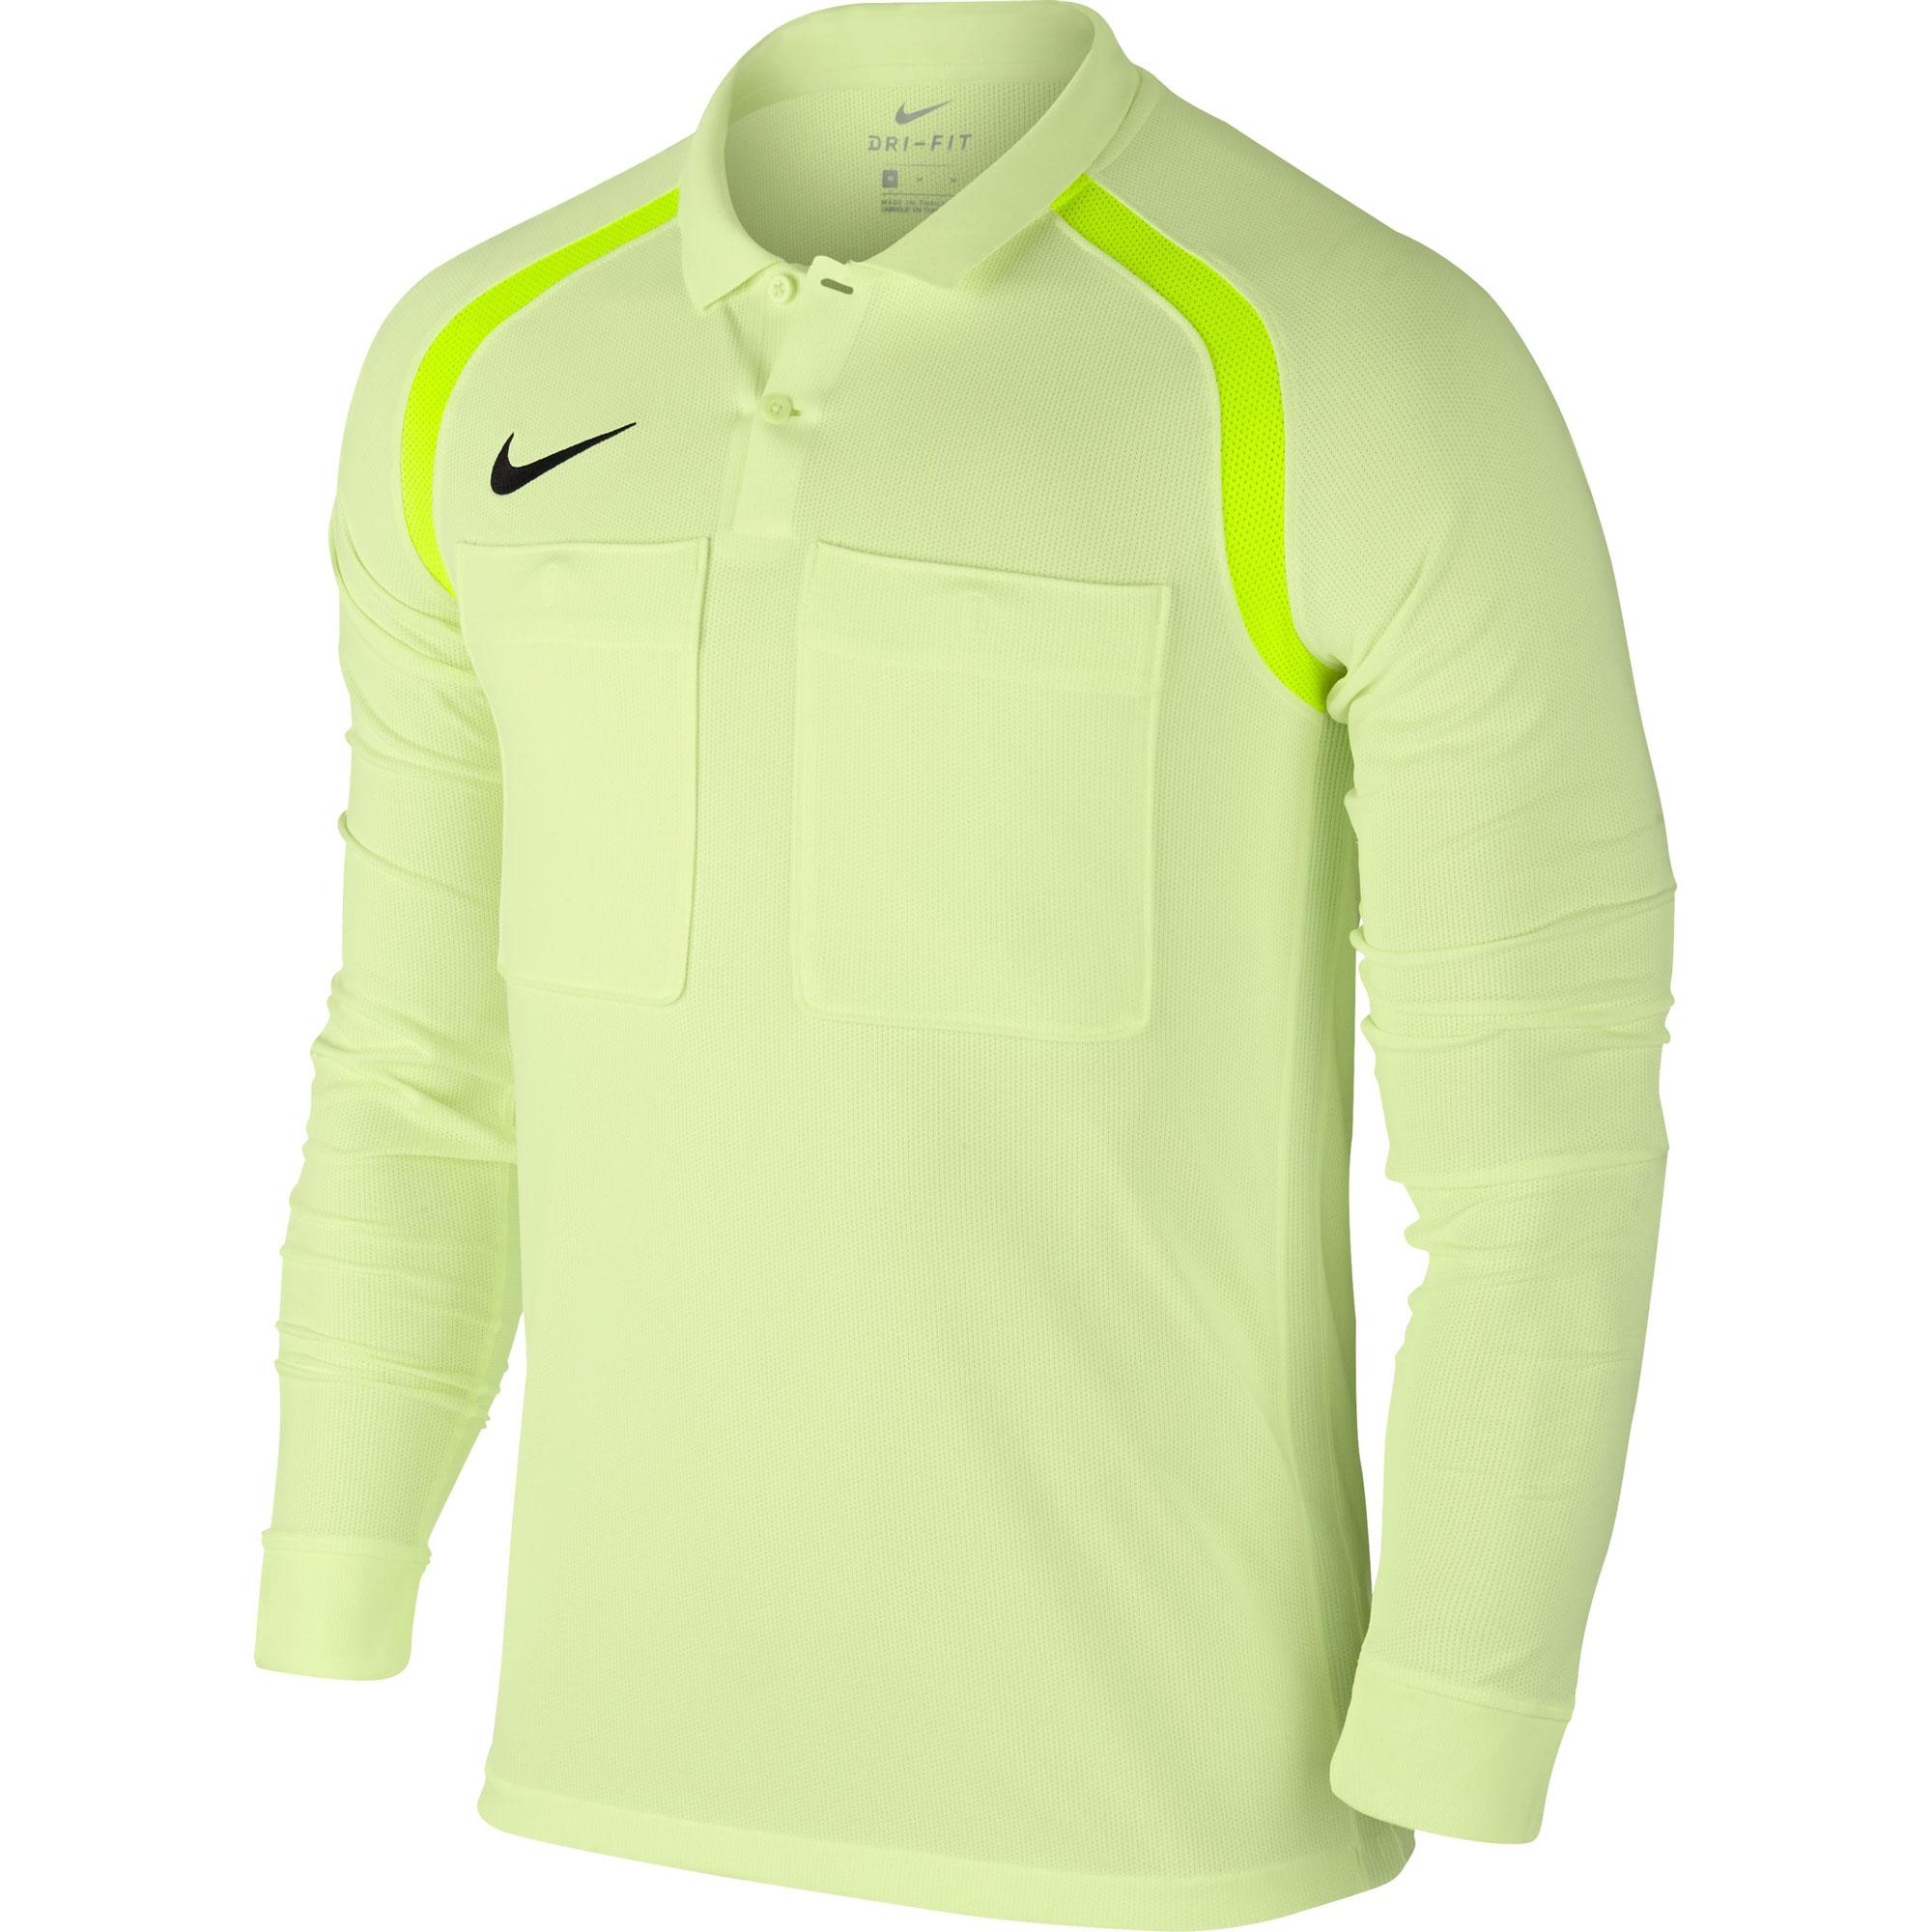 Nike Herren Schiedsrichter Langarm Trikot Team Referee Jersey 807704-701 M